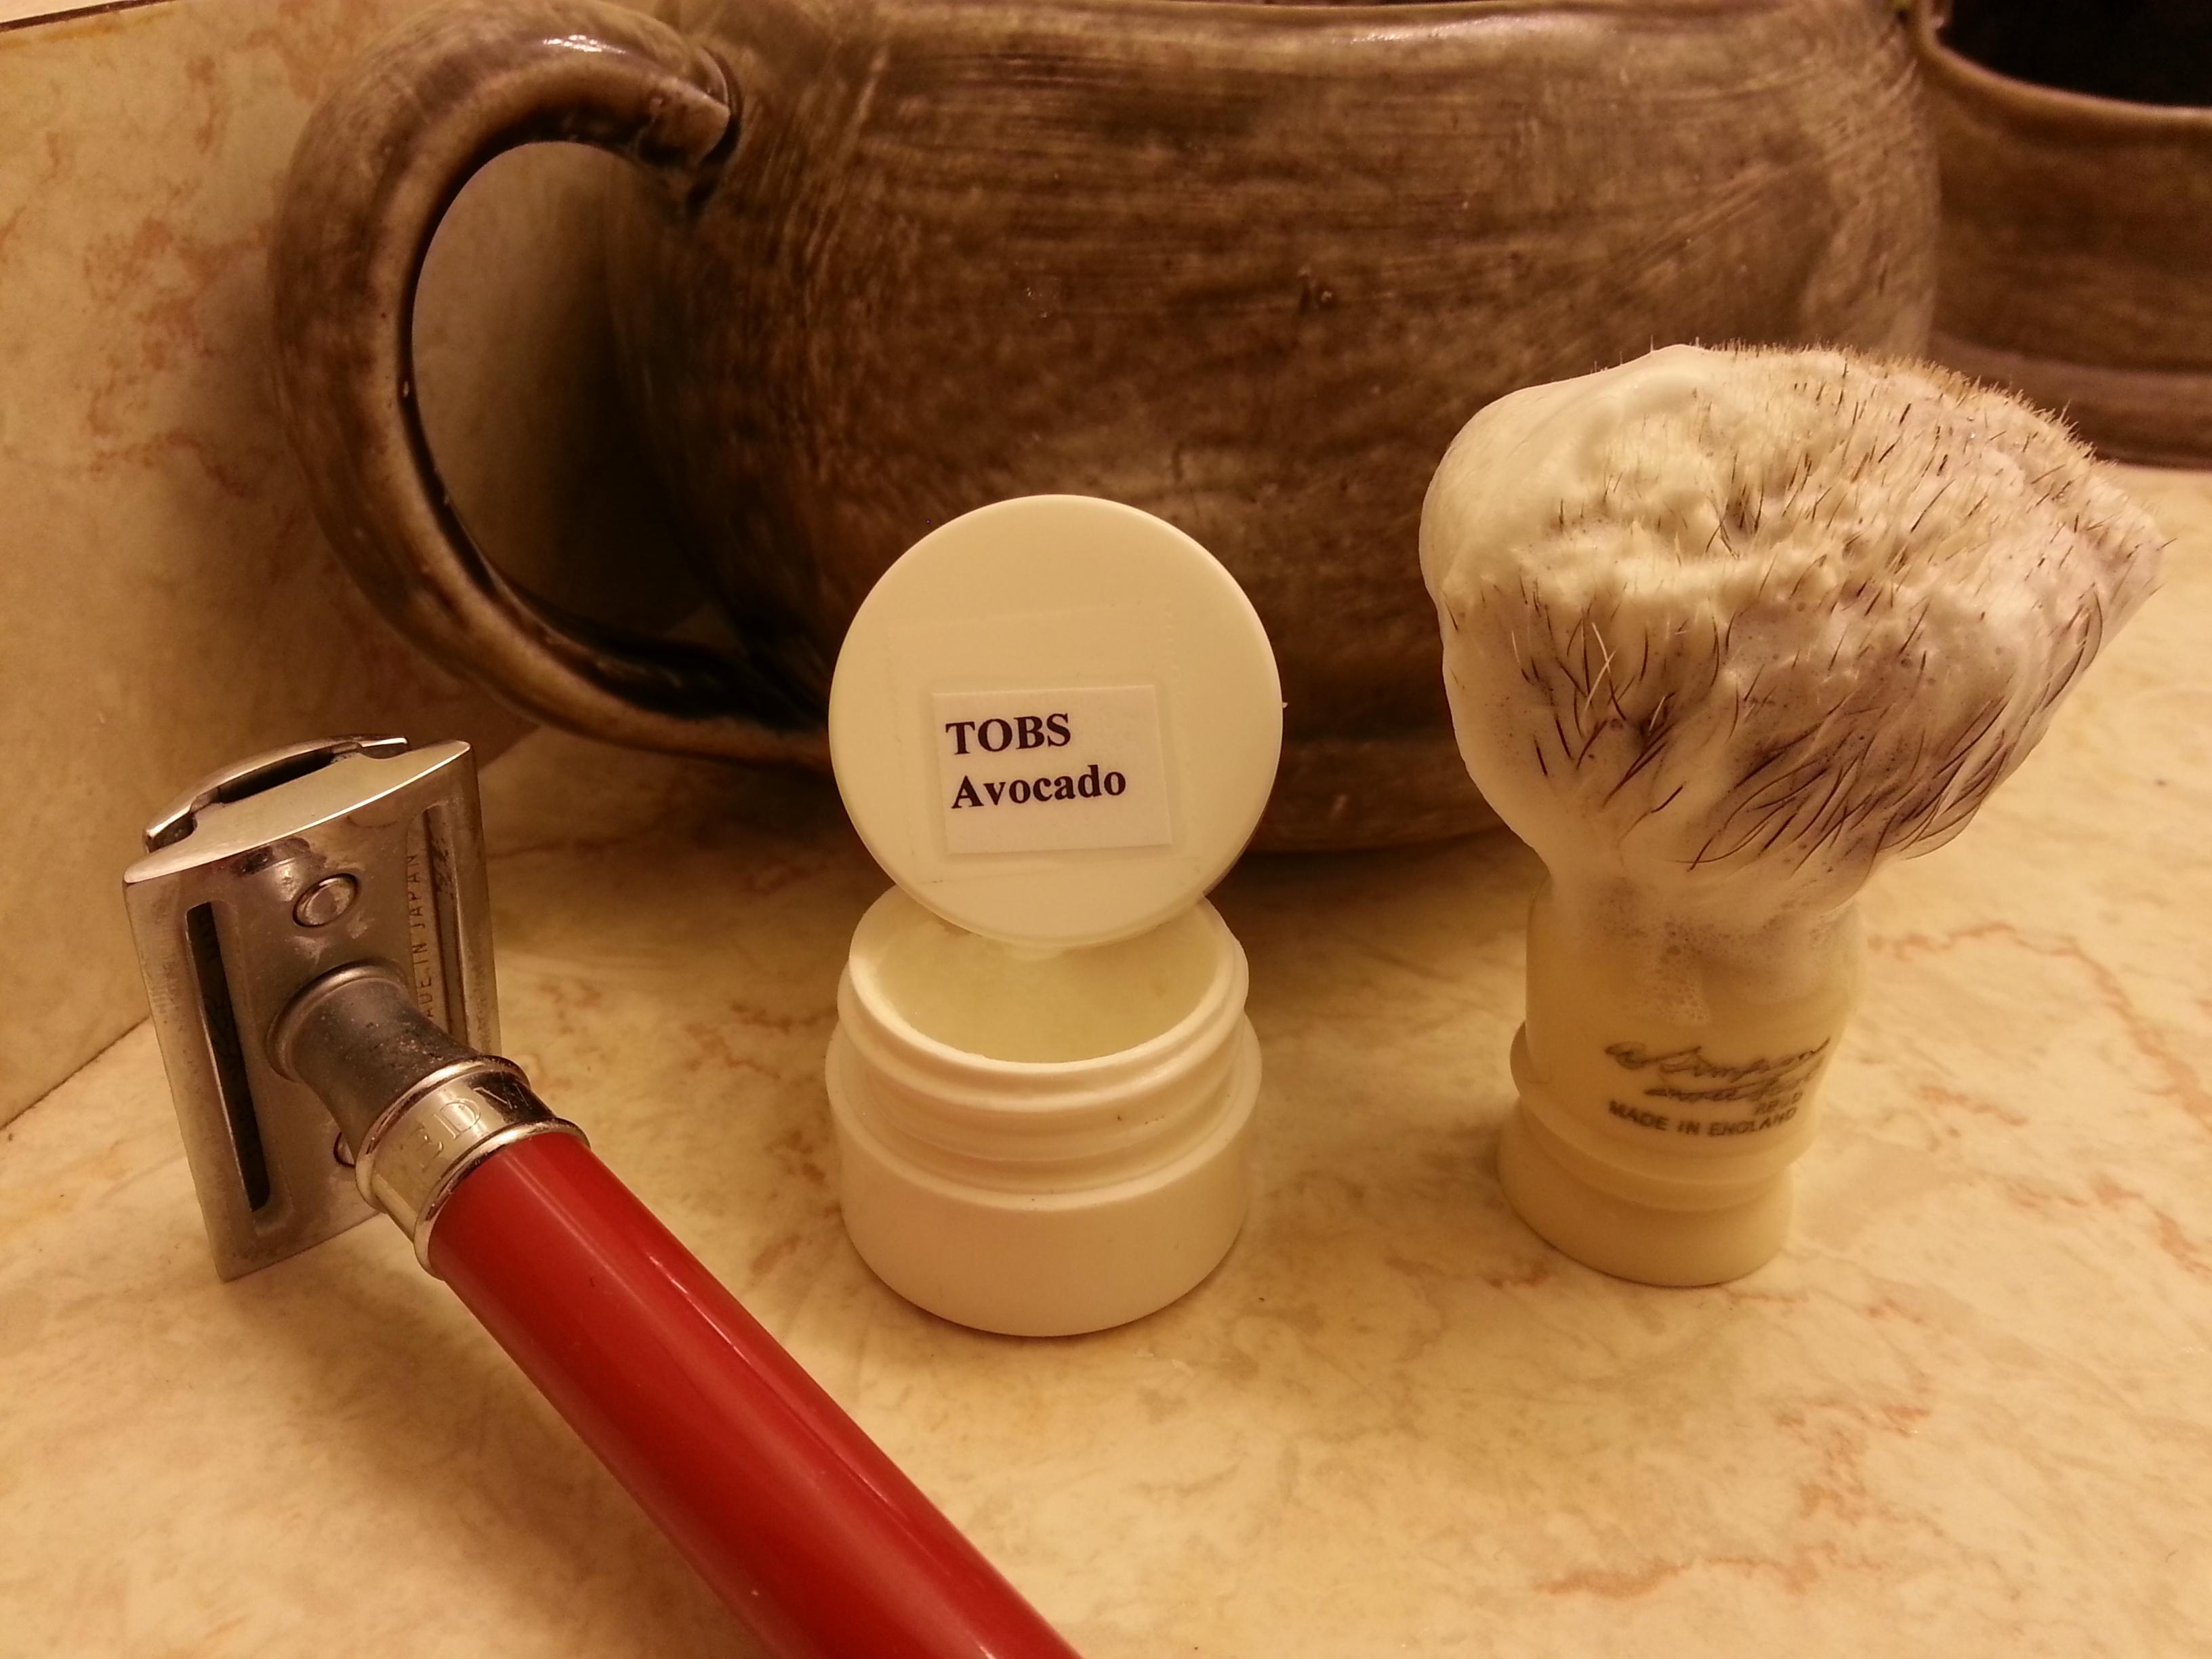 British | Palpz's Shaving Soap Reviews | Page 2